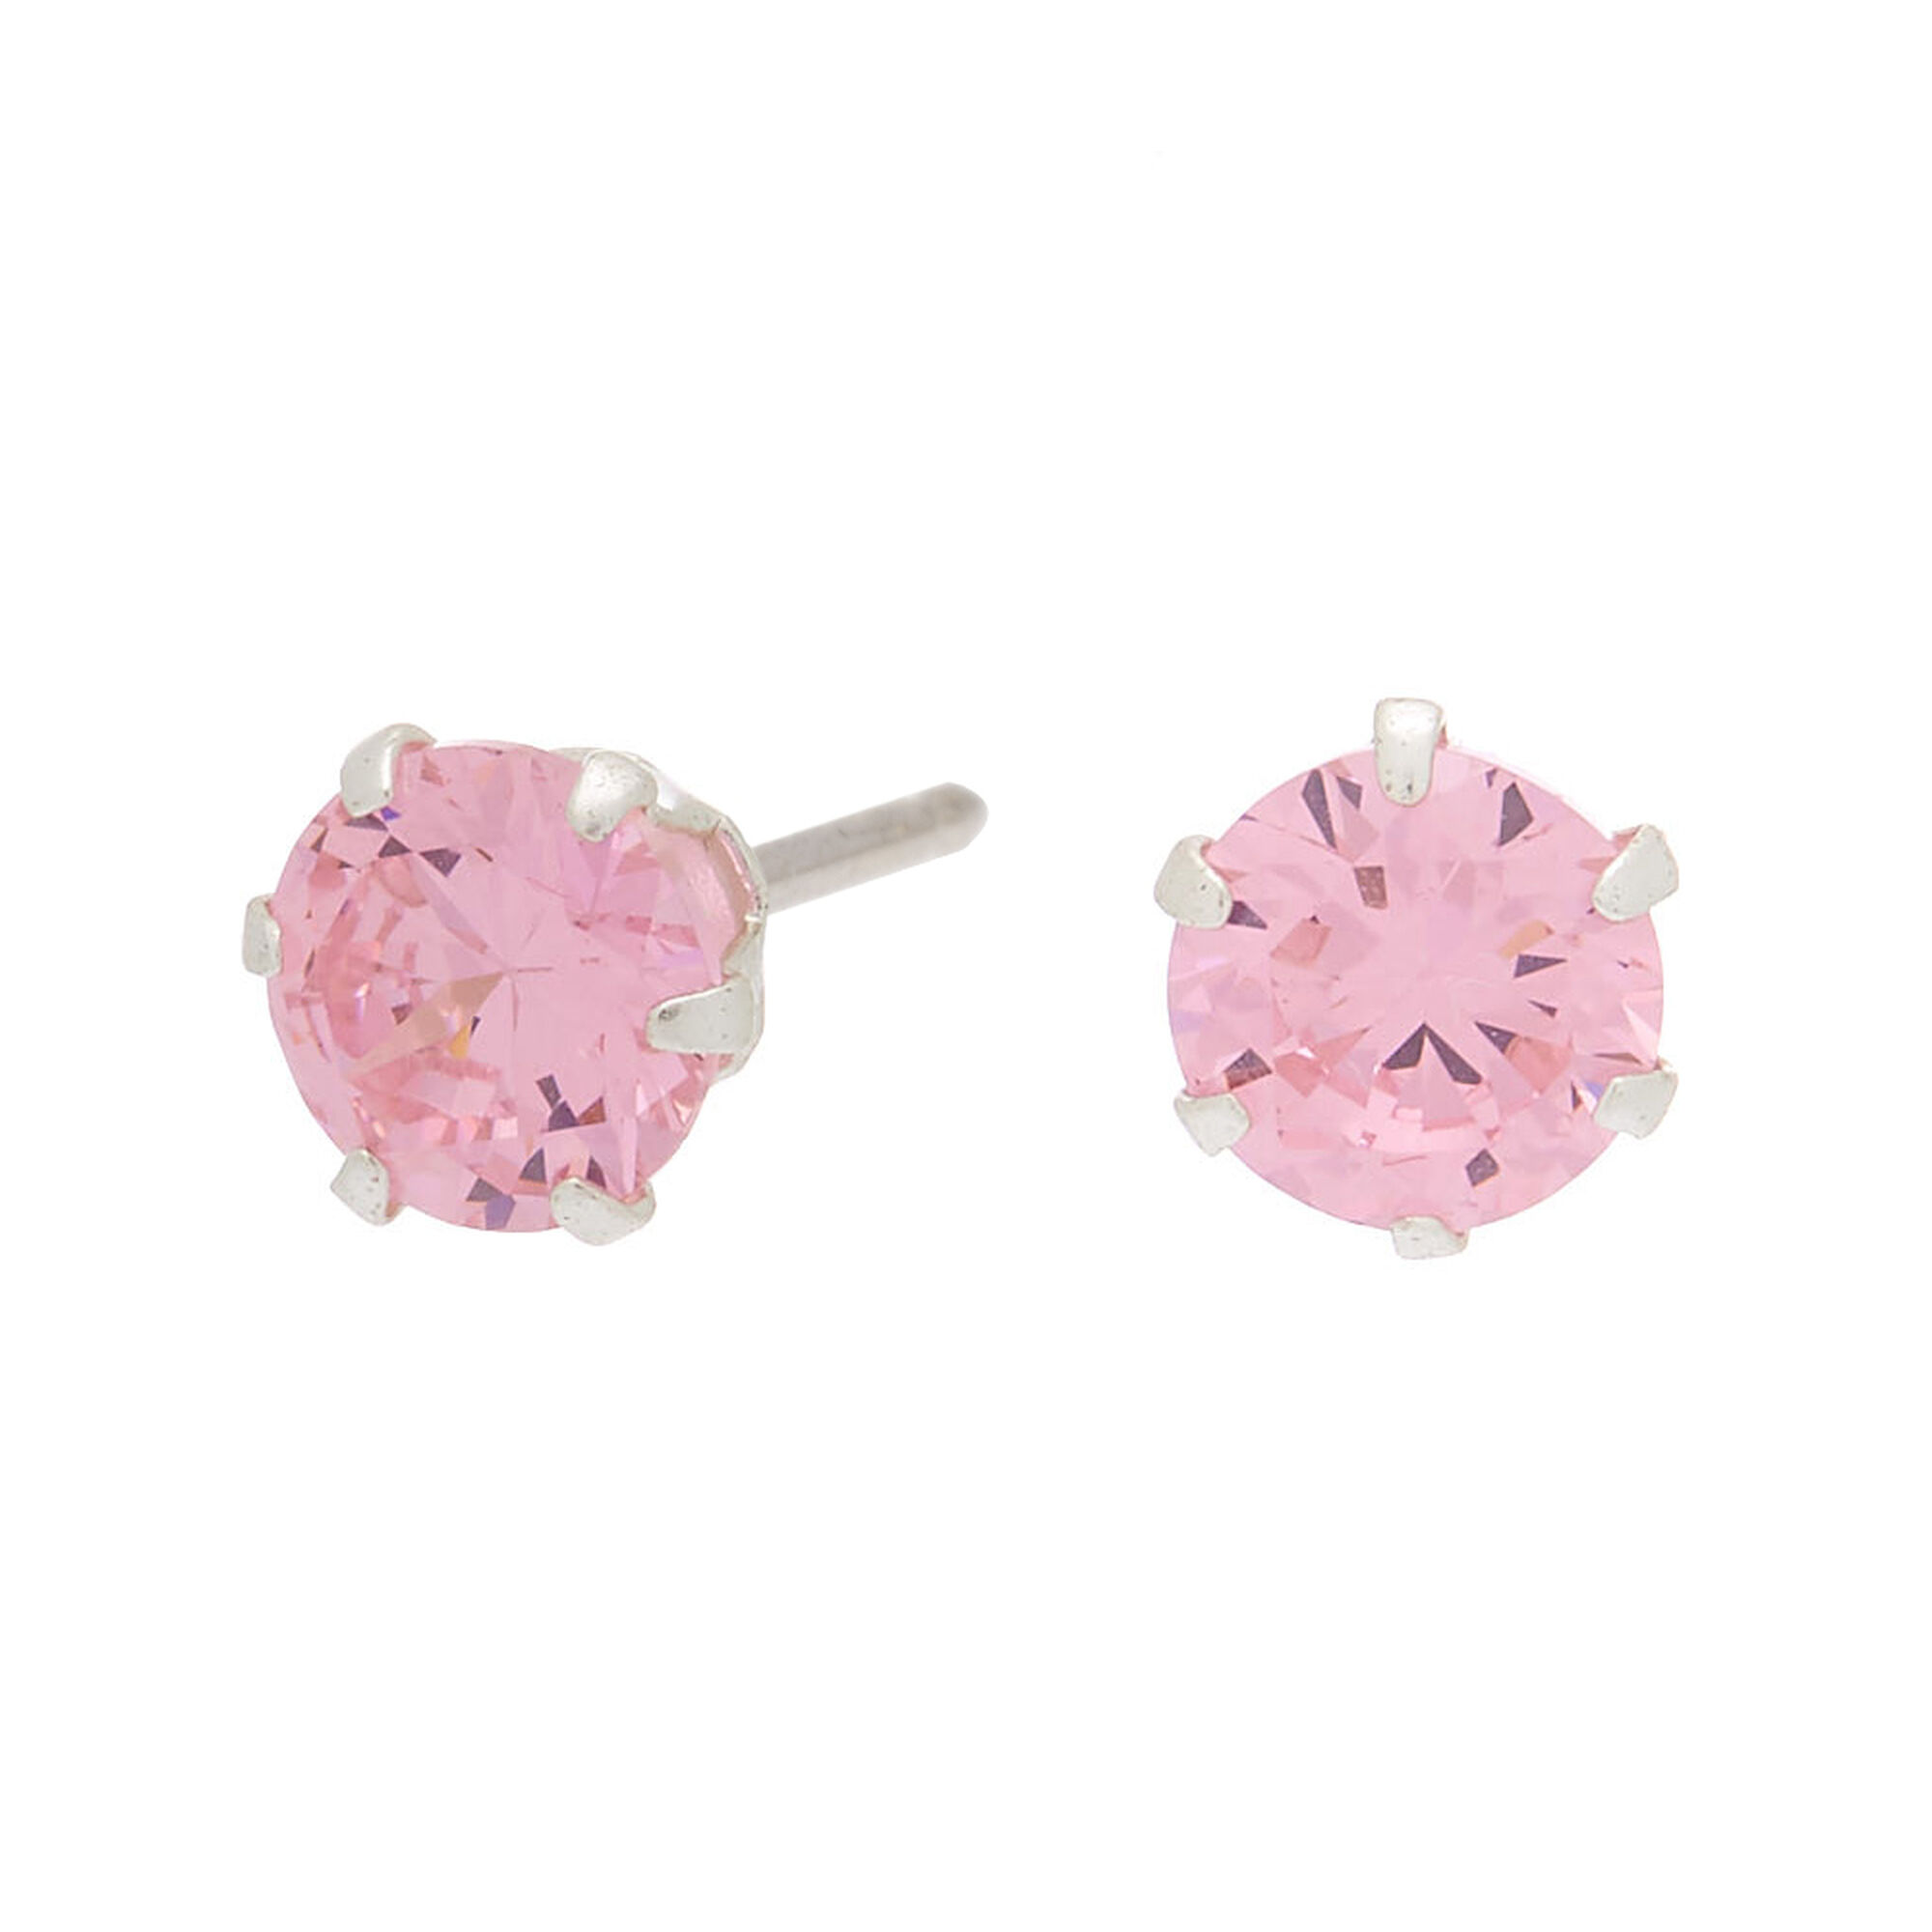 e7abdf83eb61a Sterling Silver Cubic Zirconia Stud Earrings - Pink